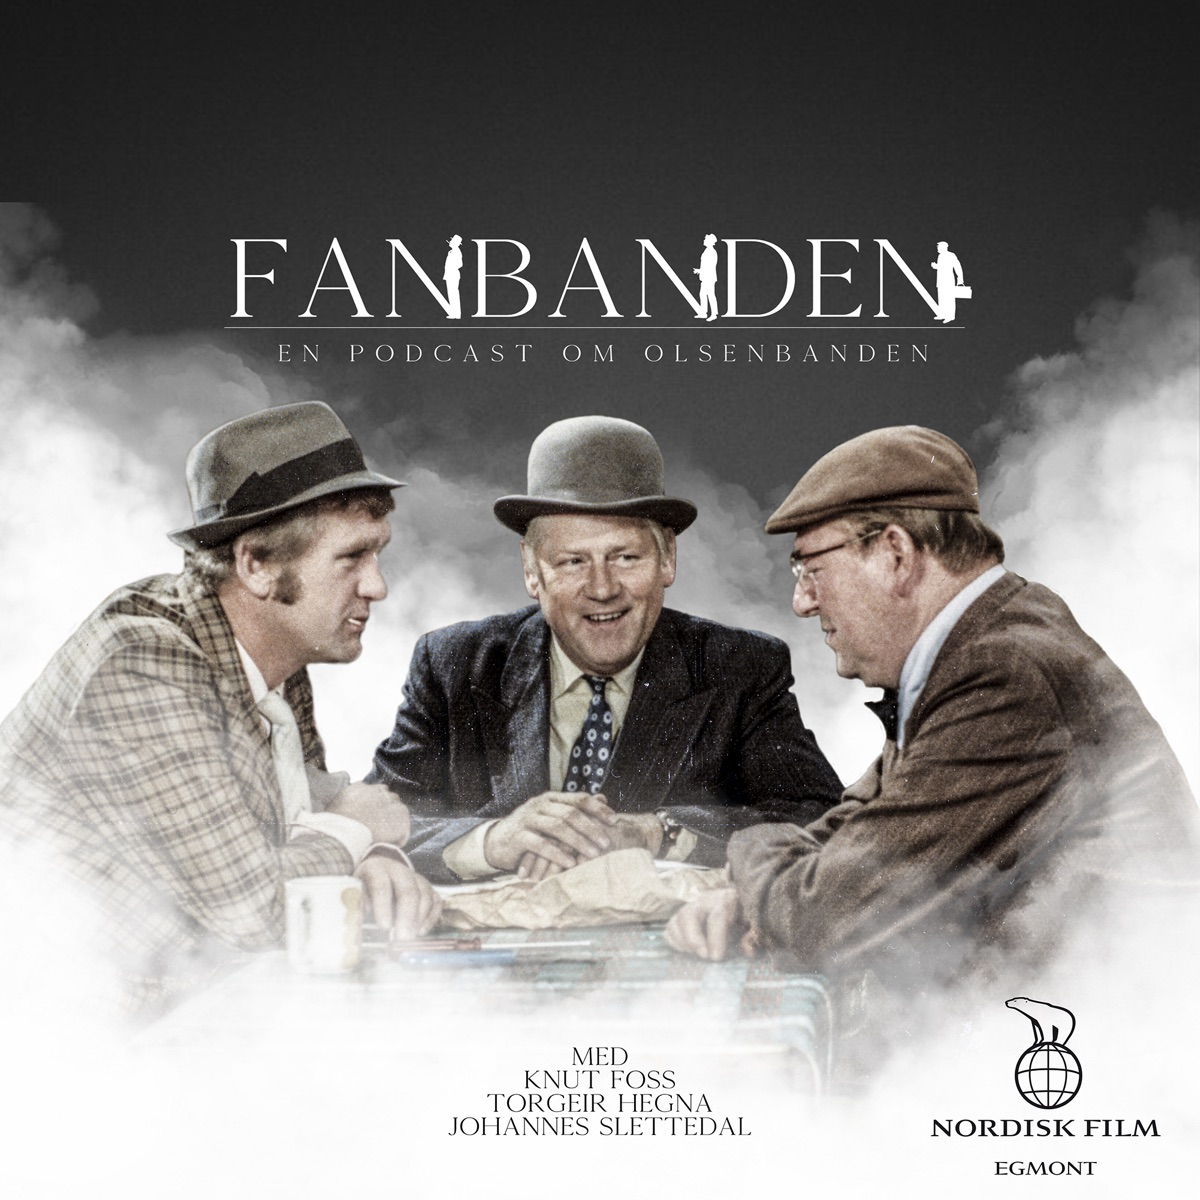 Fanbanden - en podcast om Olsenbanden